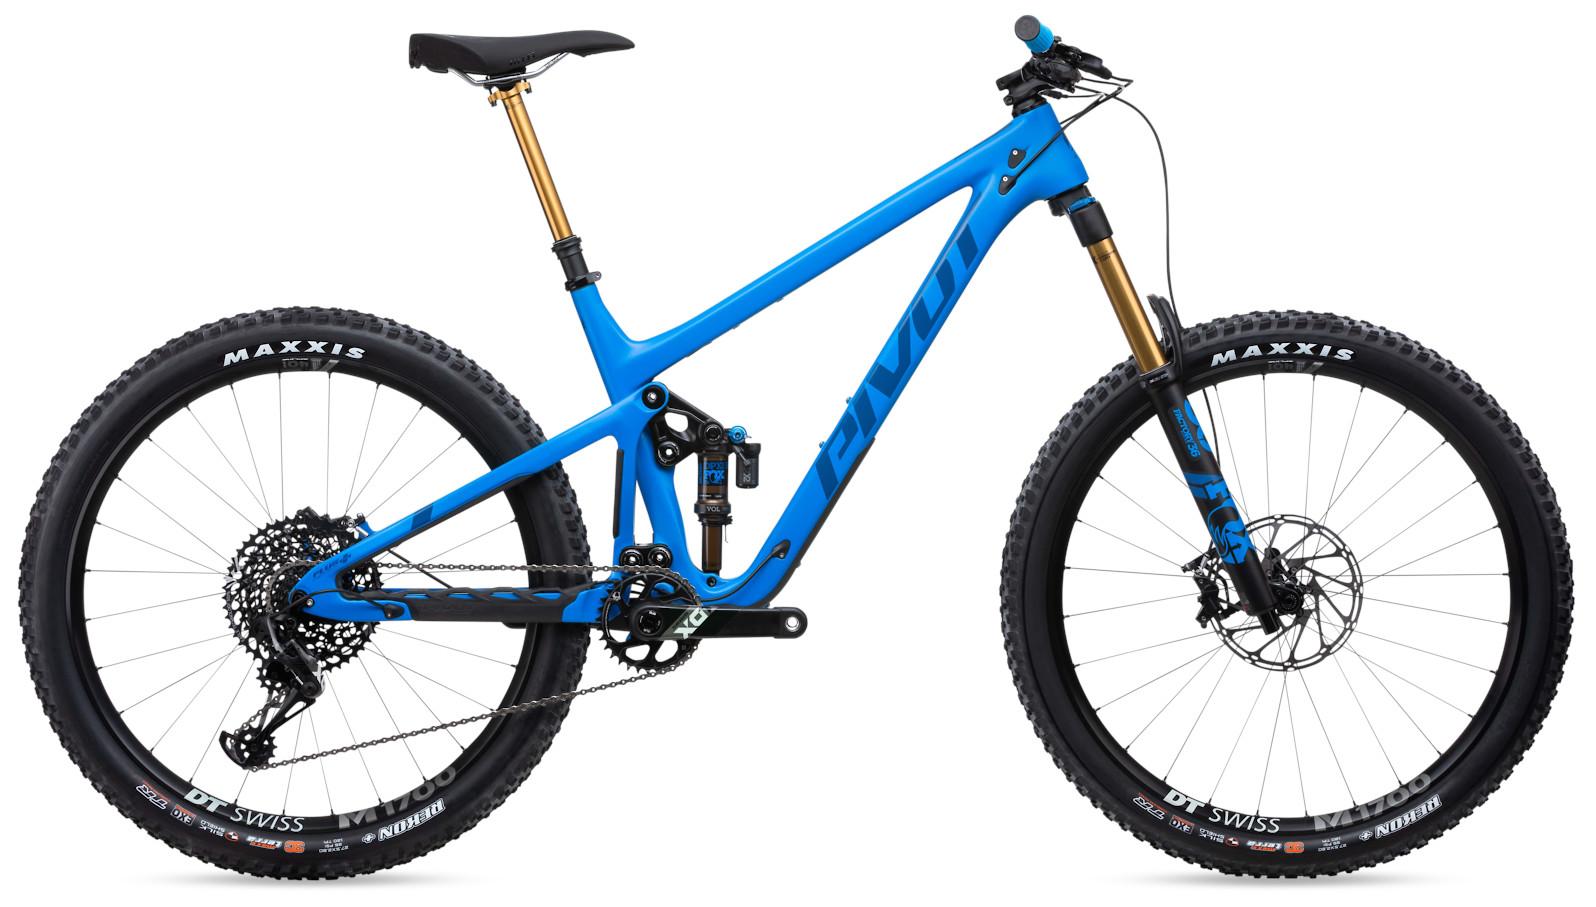 2020 Pivot Switchblade Pro X01  - Horizon Blue with 27.5+ wheels